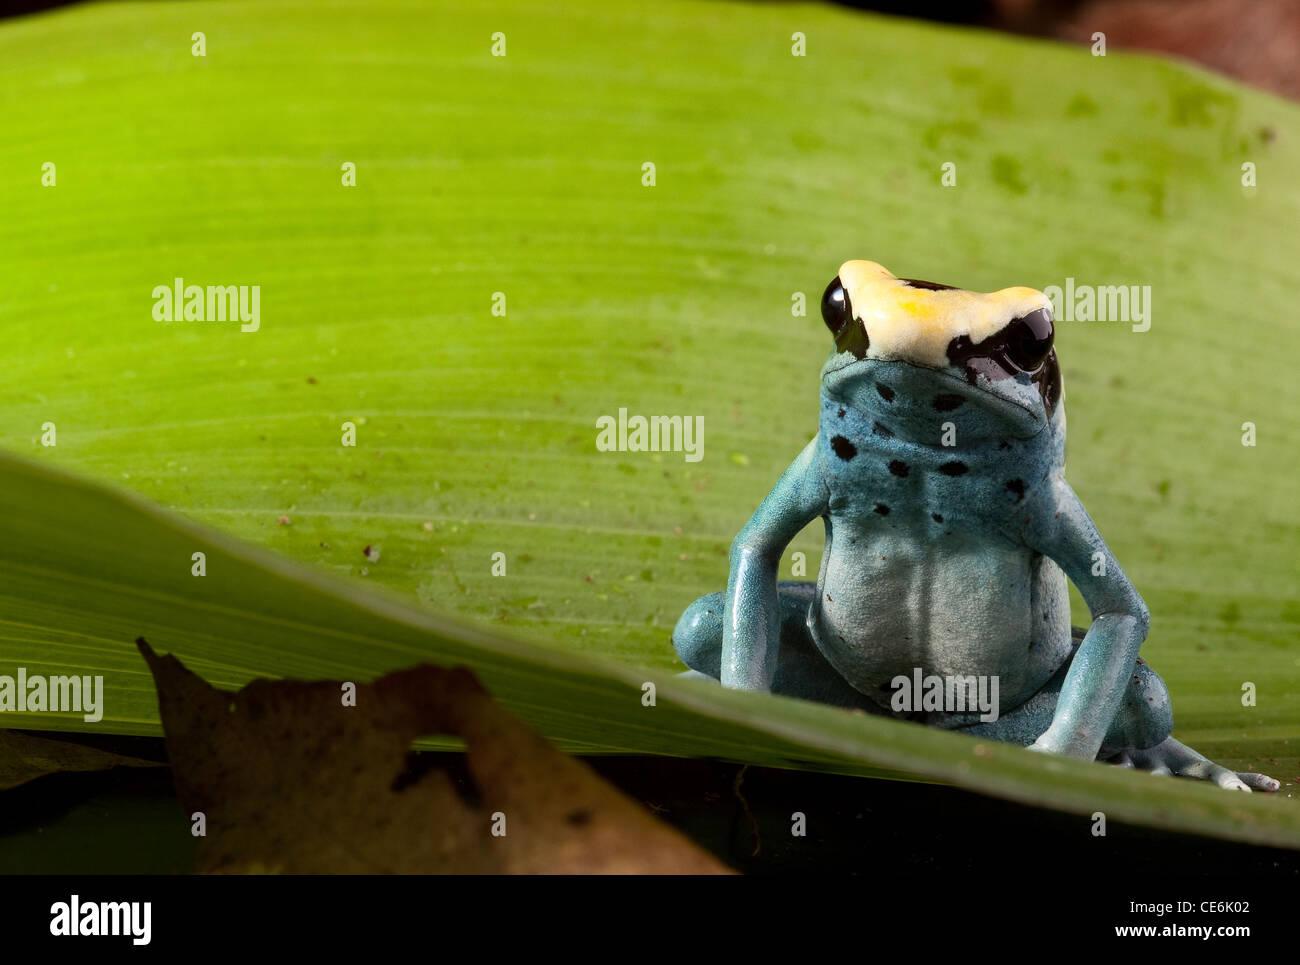 Rana Venenosa, Dendrobates tinctorius animal tropical de hoja verde Imagen De Stock